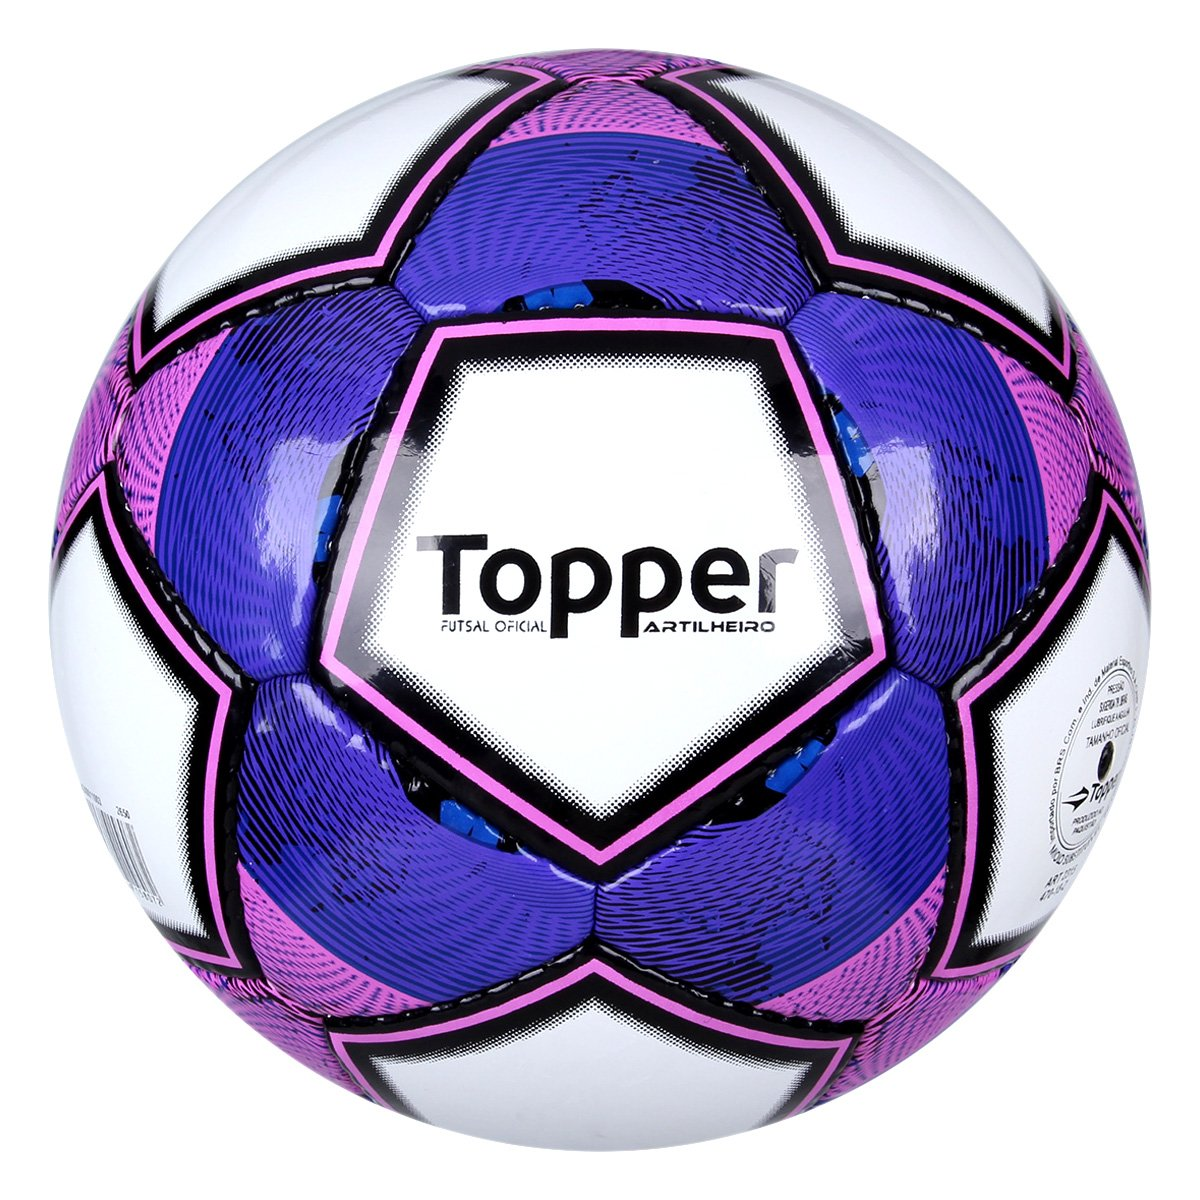 b64693f5bfdc8 Bola Futsal Topper Artilheiro - Compre Agora